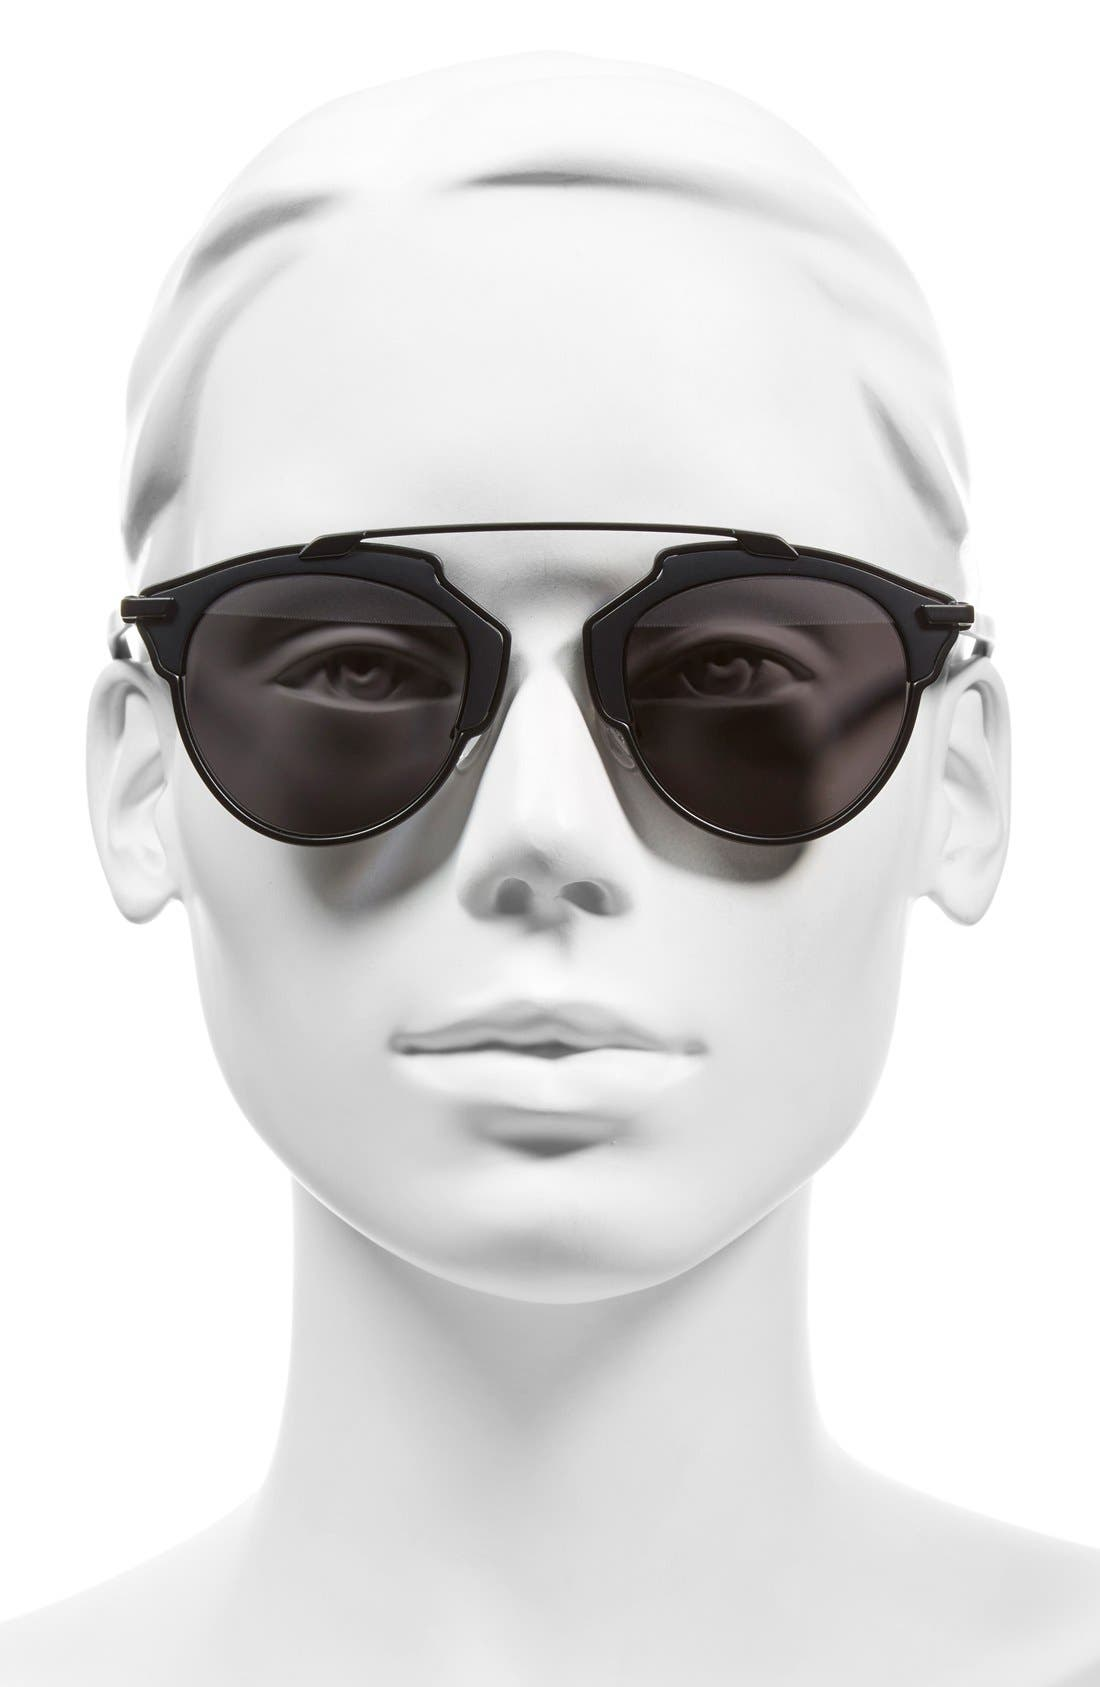 So Real 48mm Brow Bar Sunglasses,                             Alternate thumbnail 30, color,